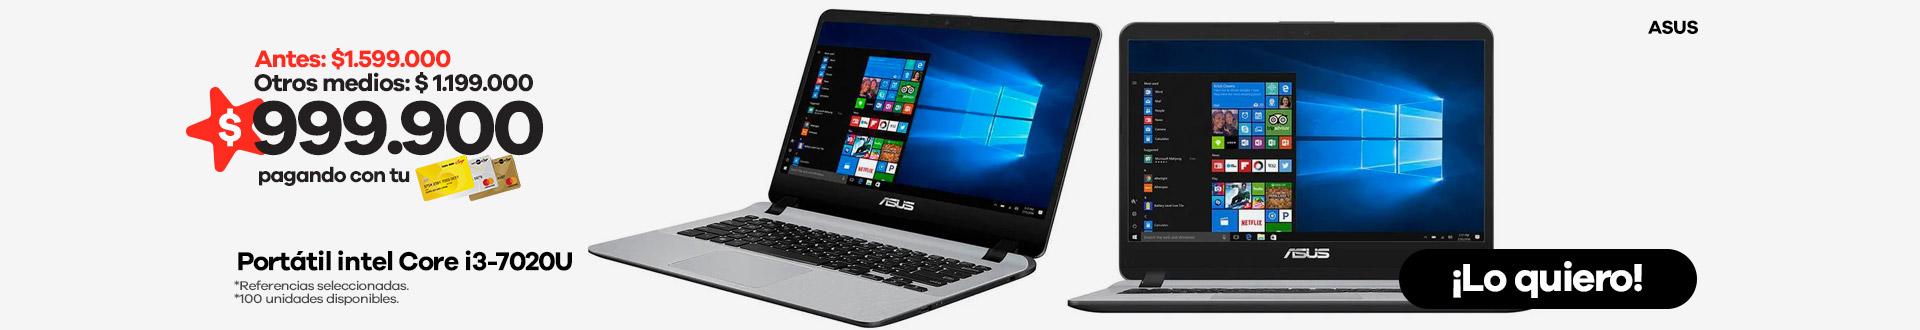 20191125_asus_bn_computadores